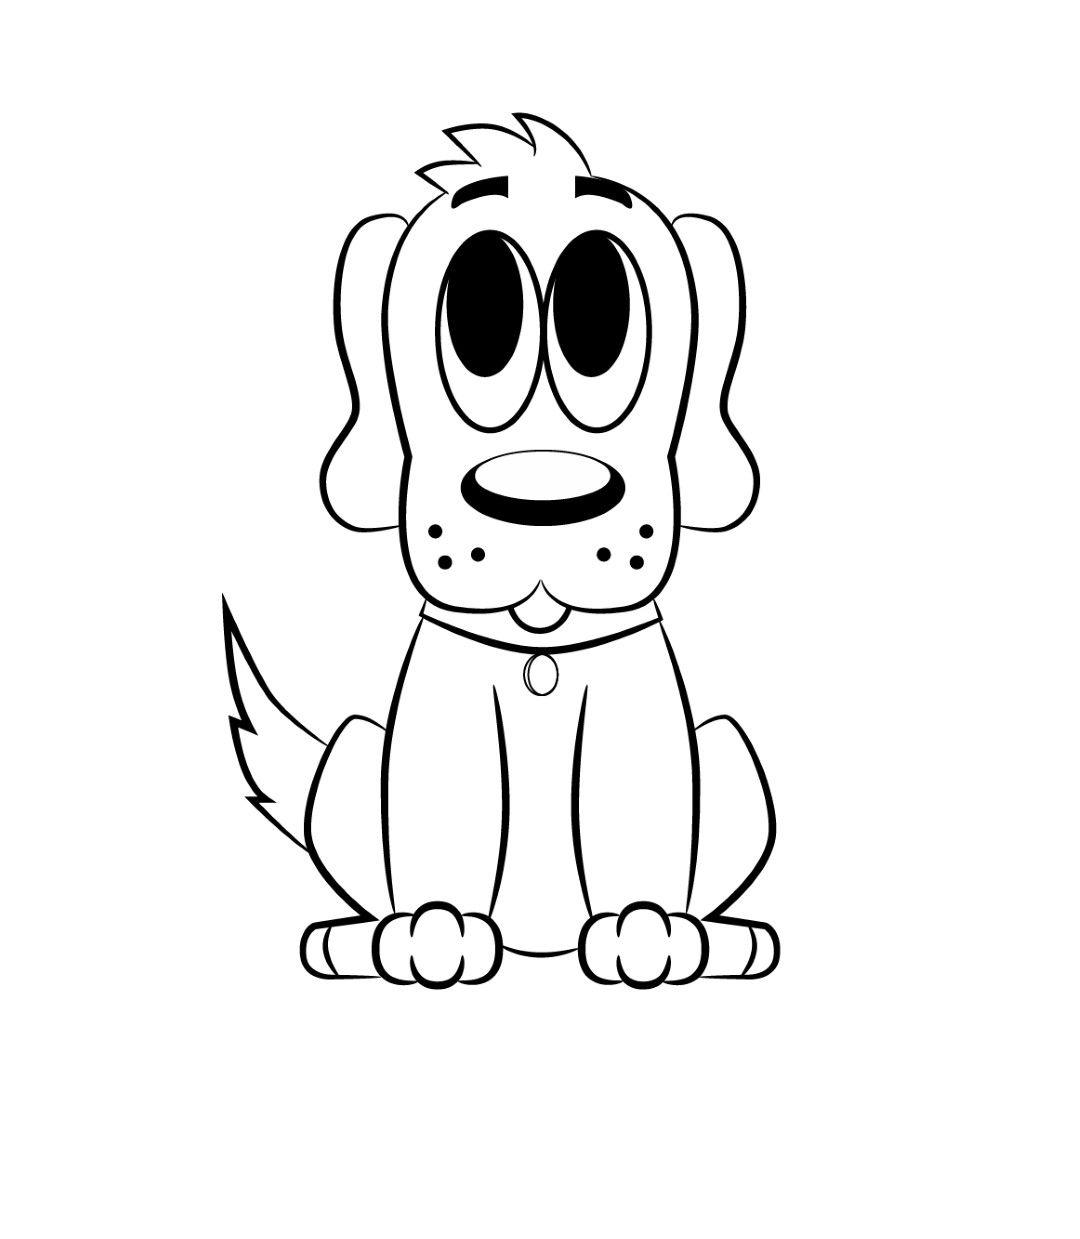 1080x1239 How To Draw A Cartoon Dog Cartoon And Tutorials